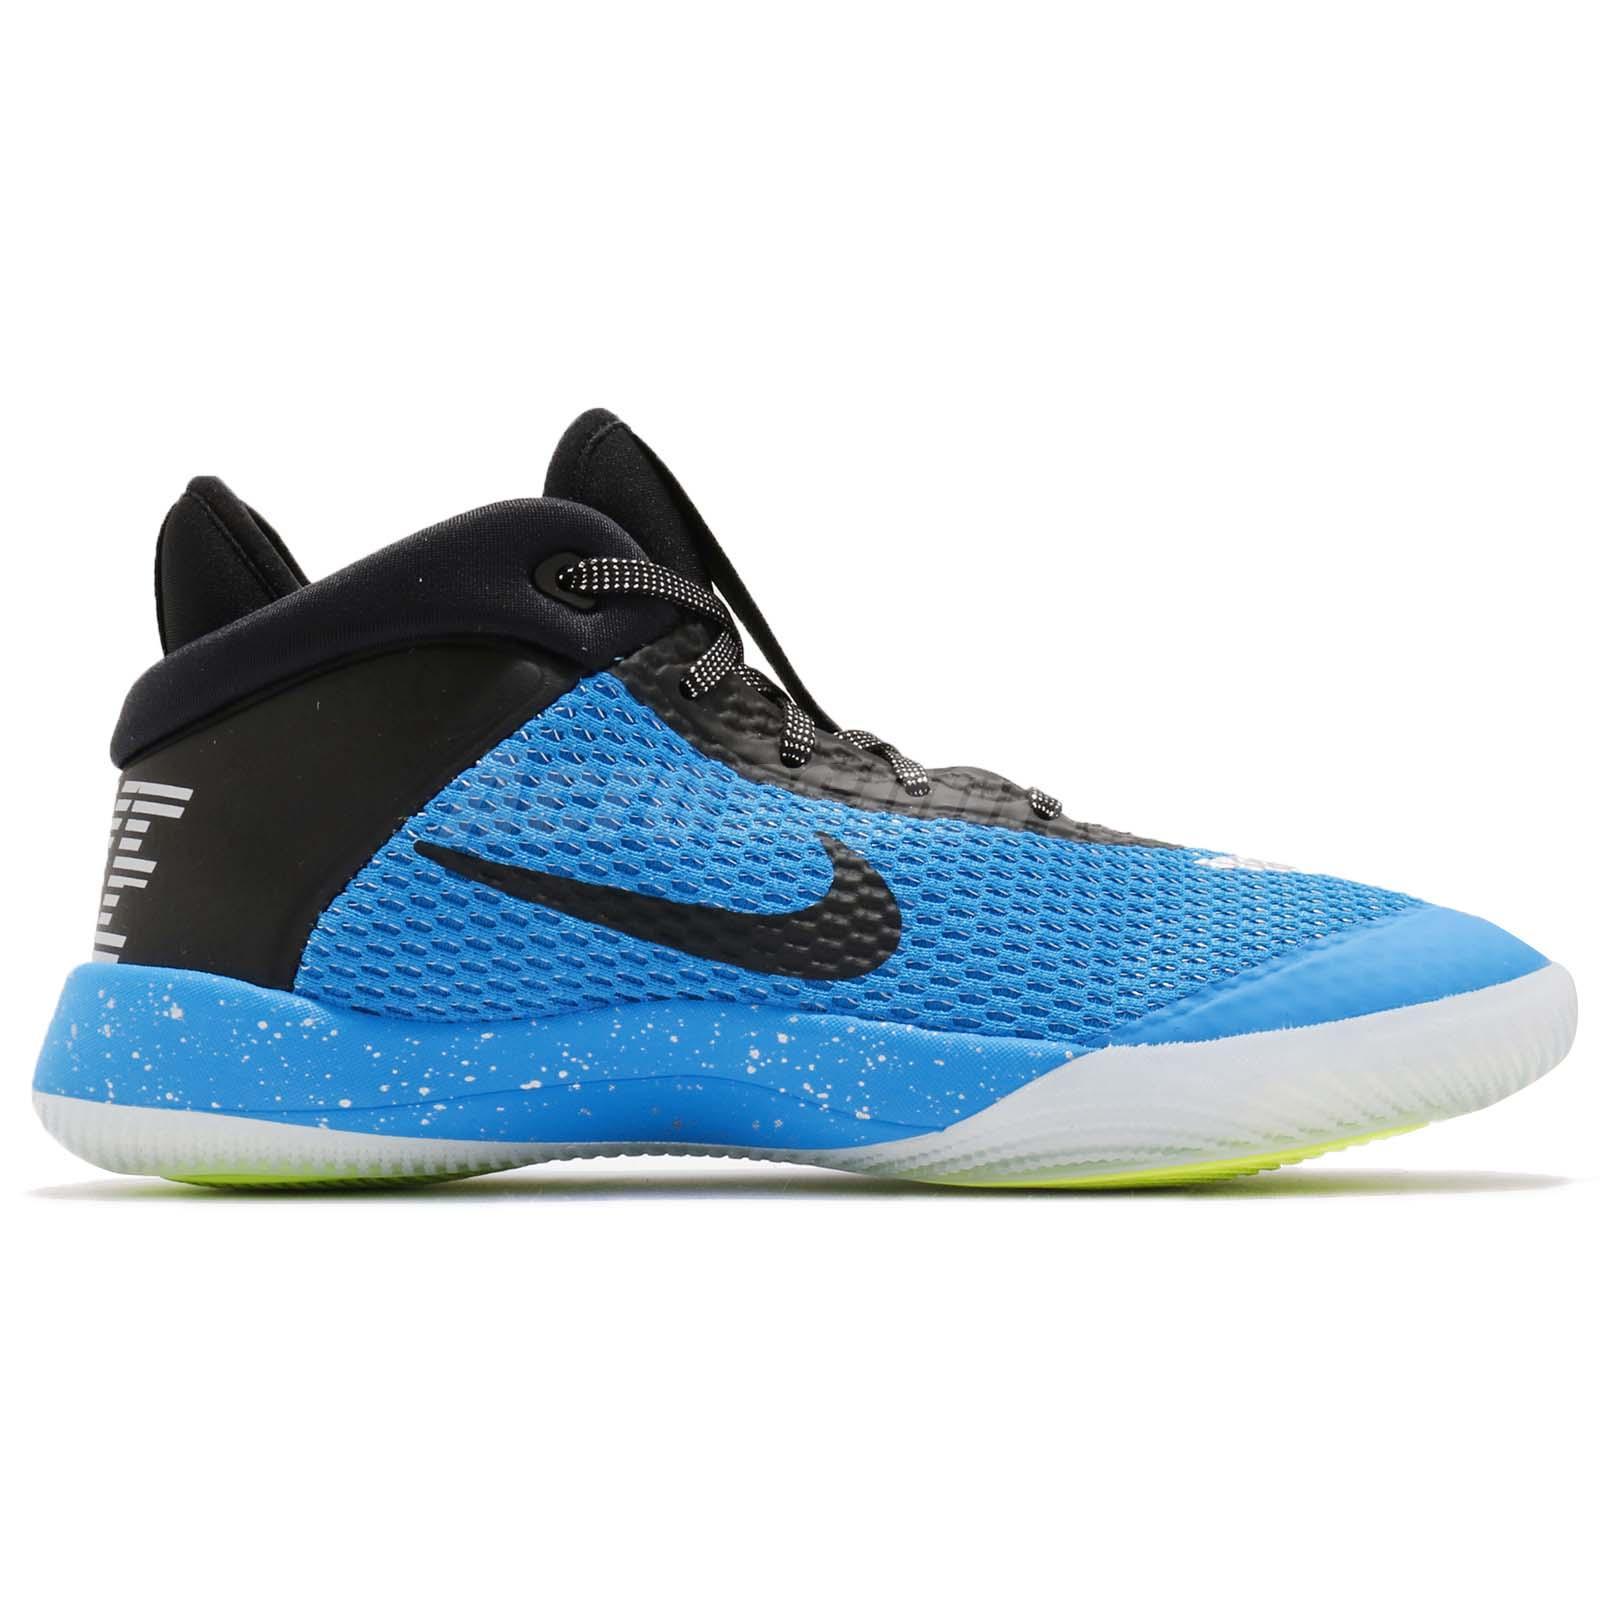 6734febd2edb64 Nike Future Flight GS Blue Black White Kid Youth Women Basketball ...